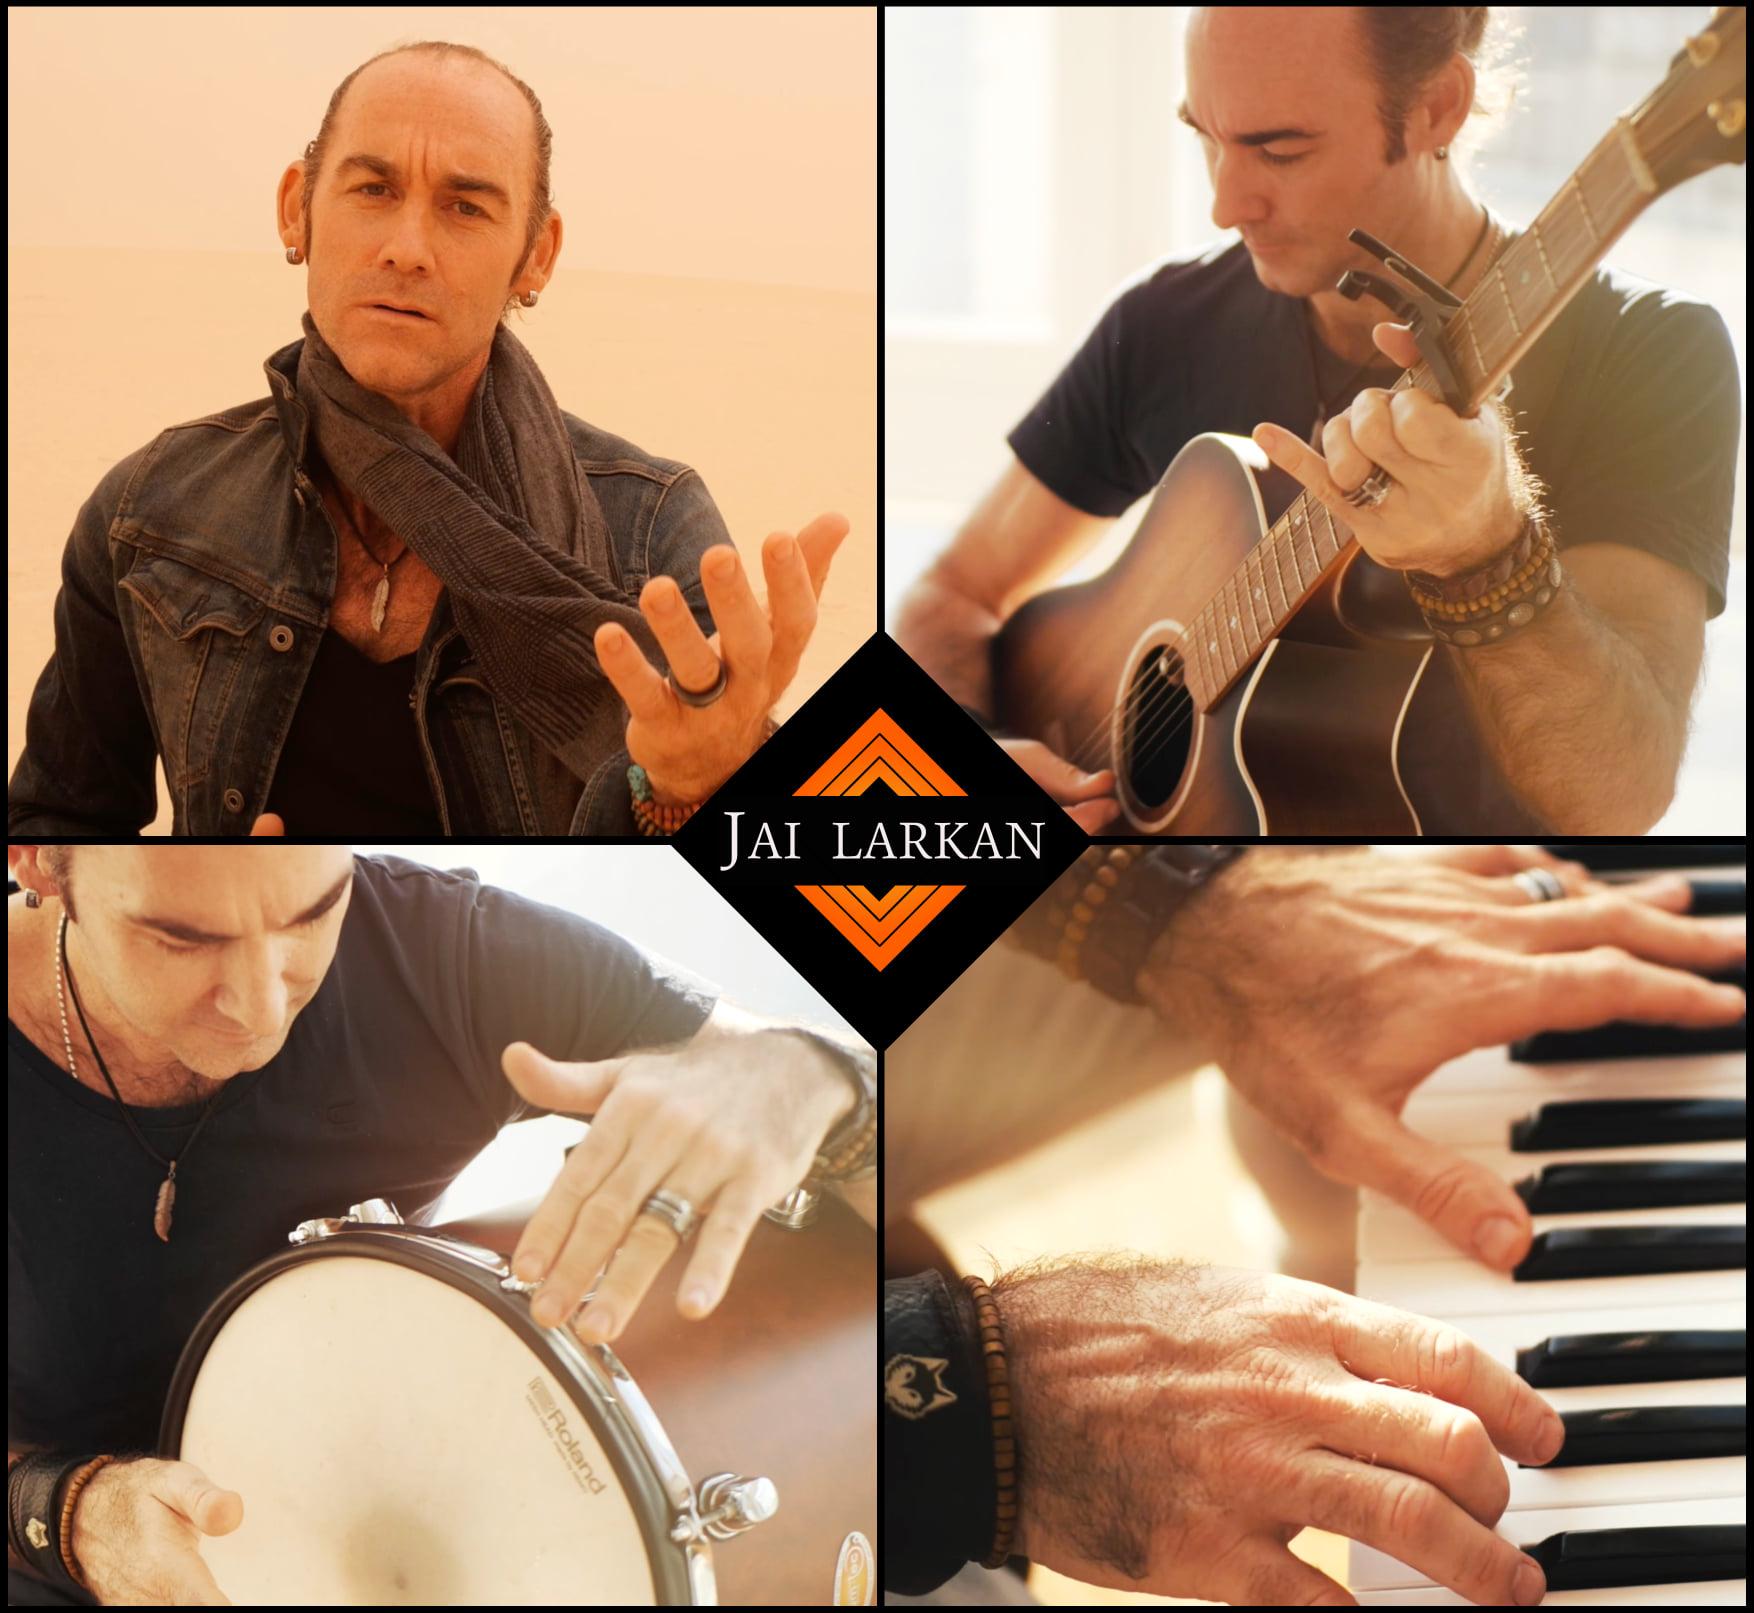 Jai Larkan — Australian Multi-instrumentalist and Loop Artist - 2021 Tour